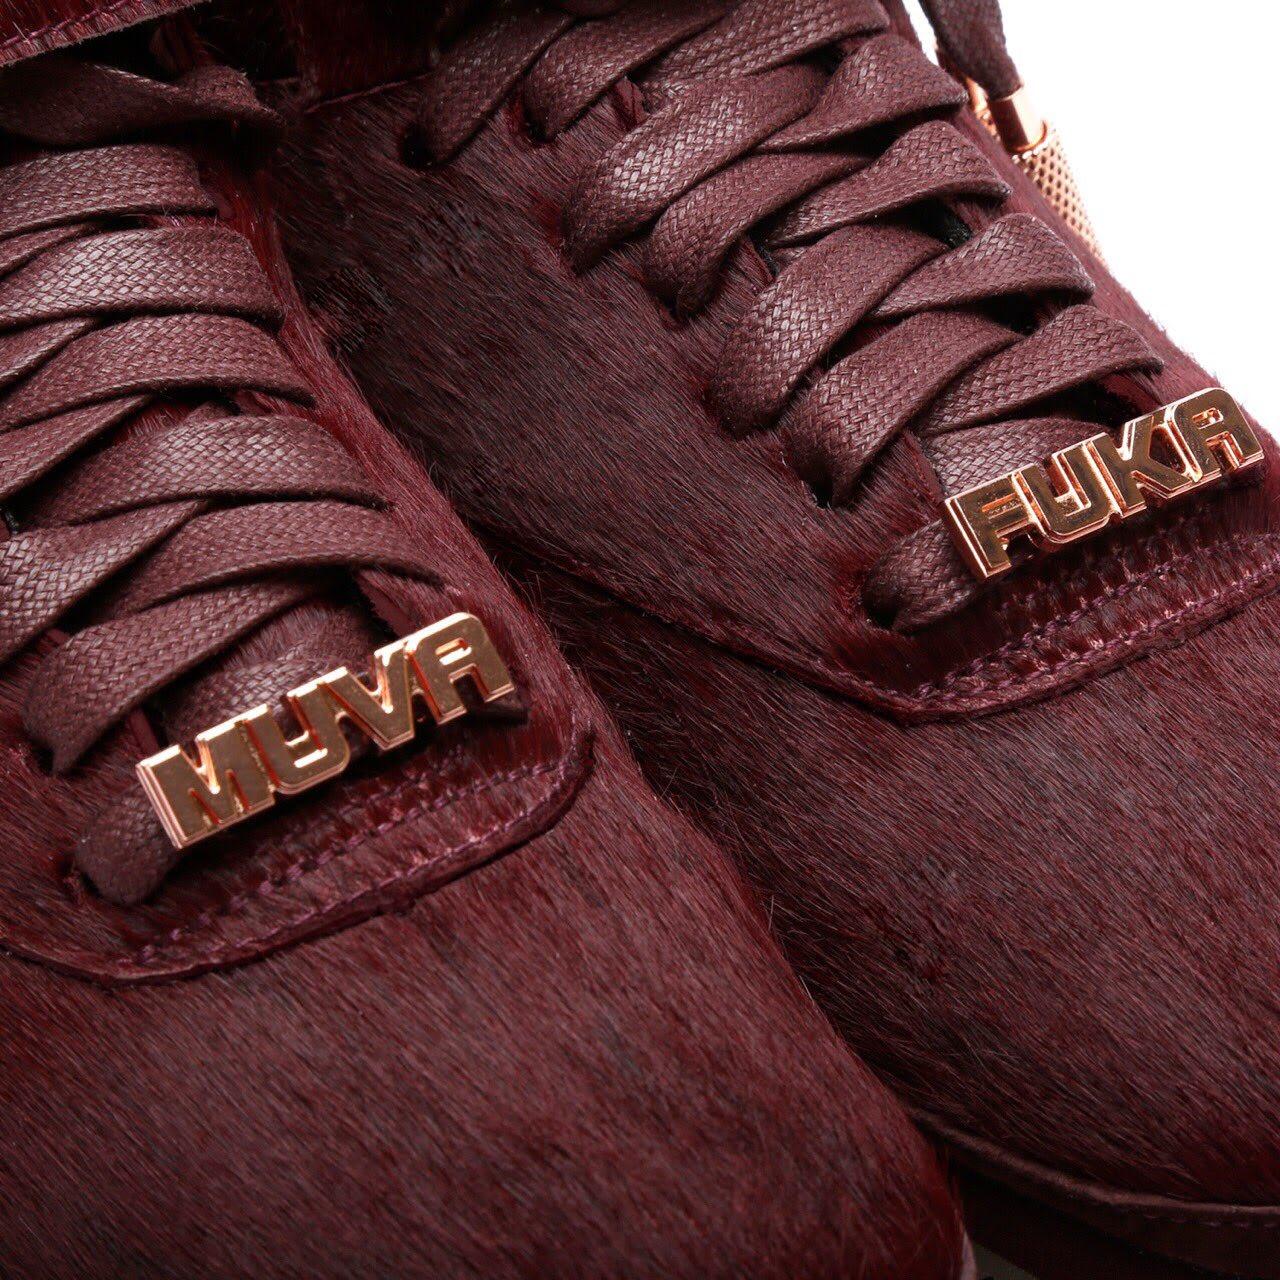 Amber Rose Reebok Muva Fuka Sneakers Deubres